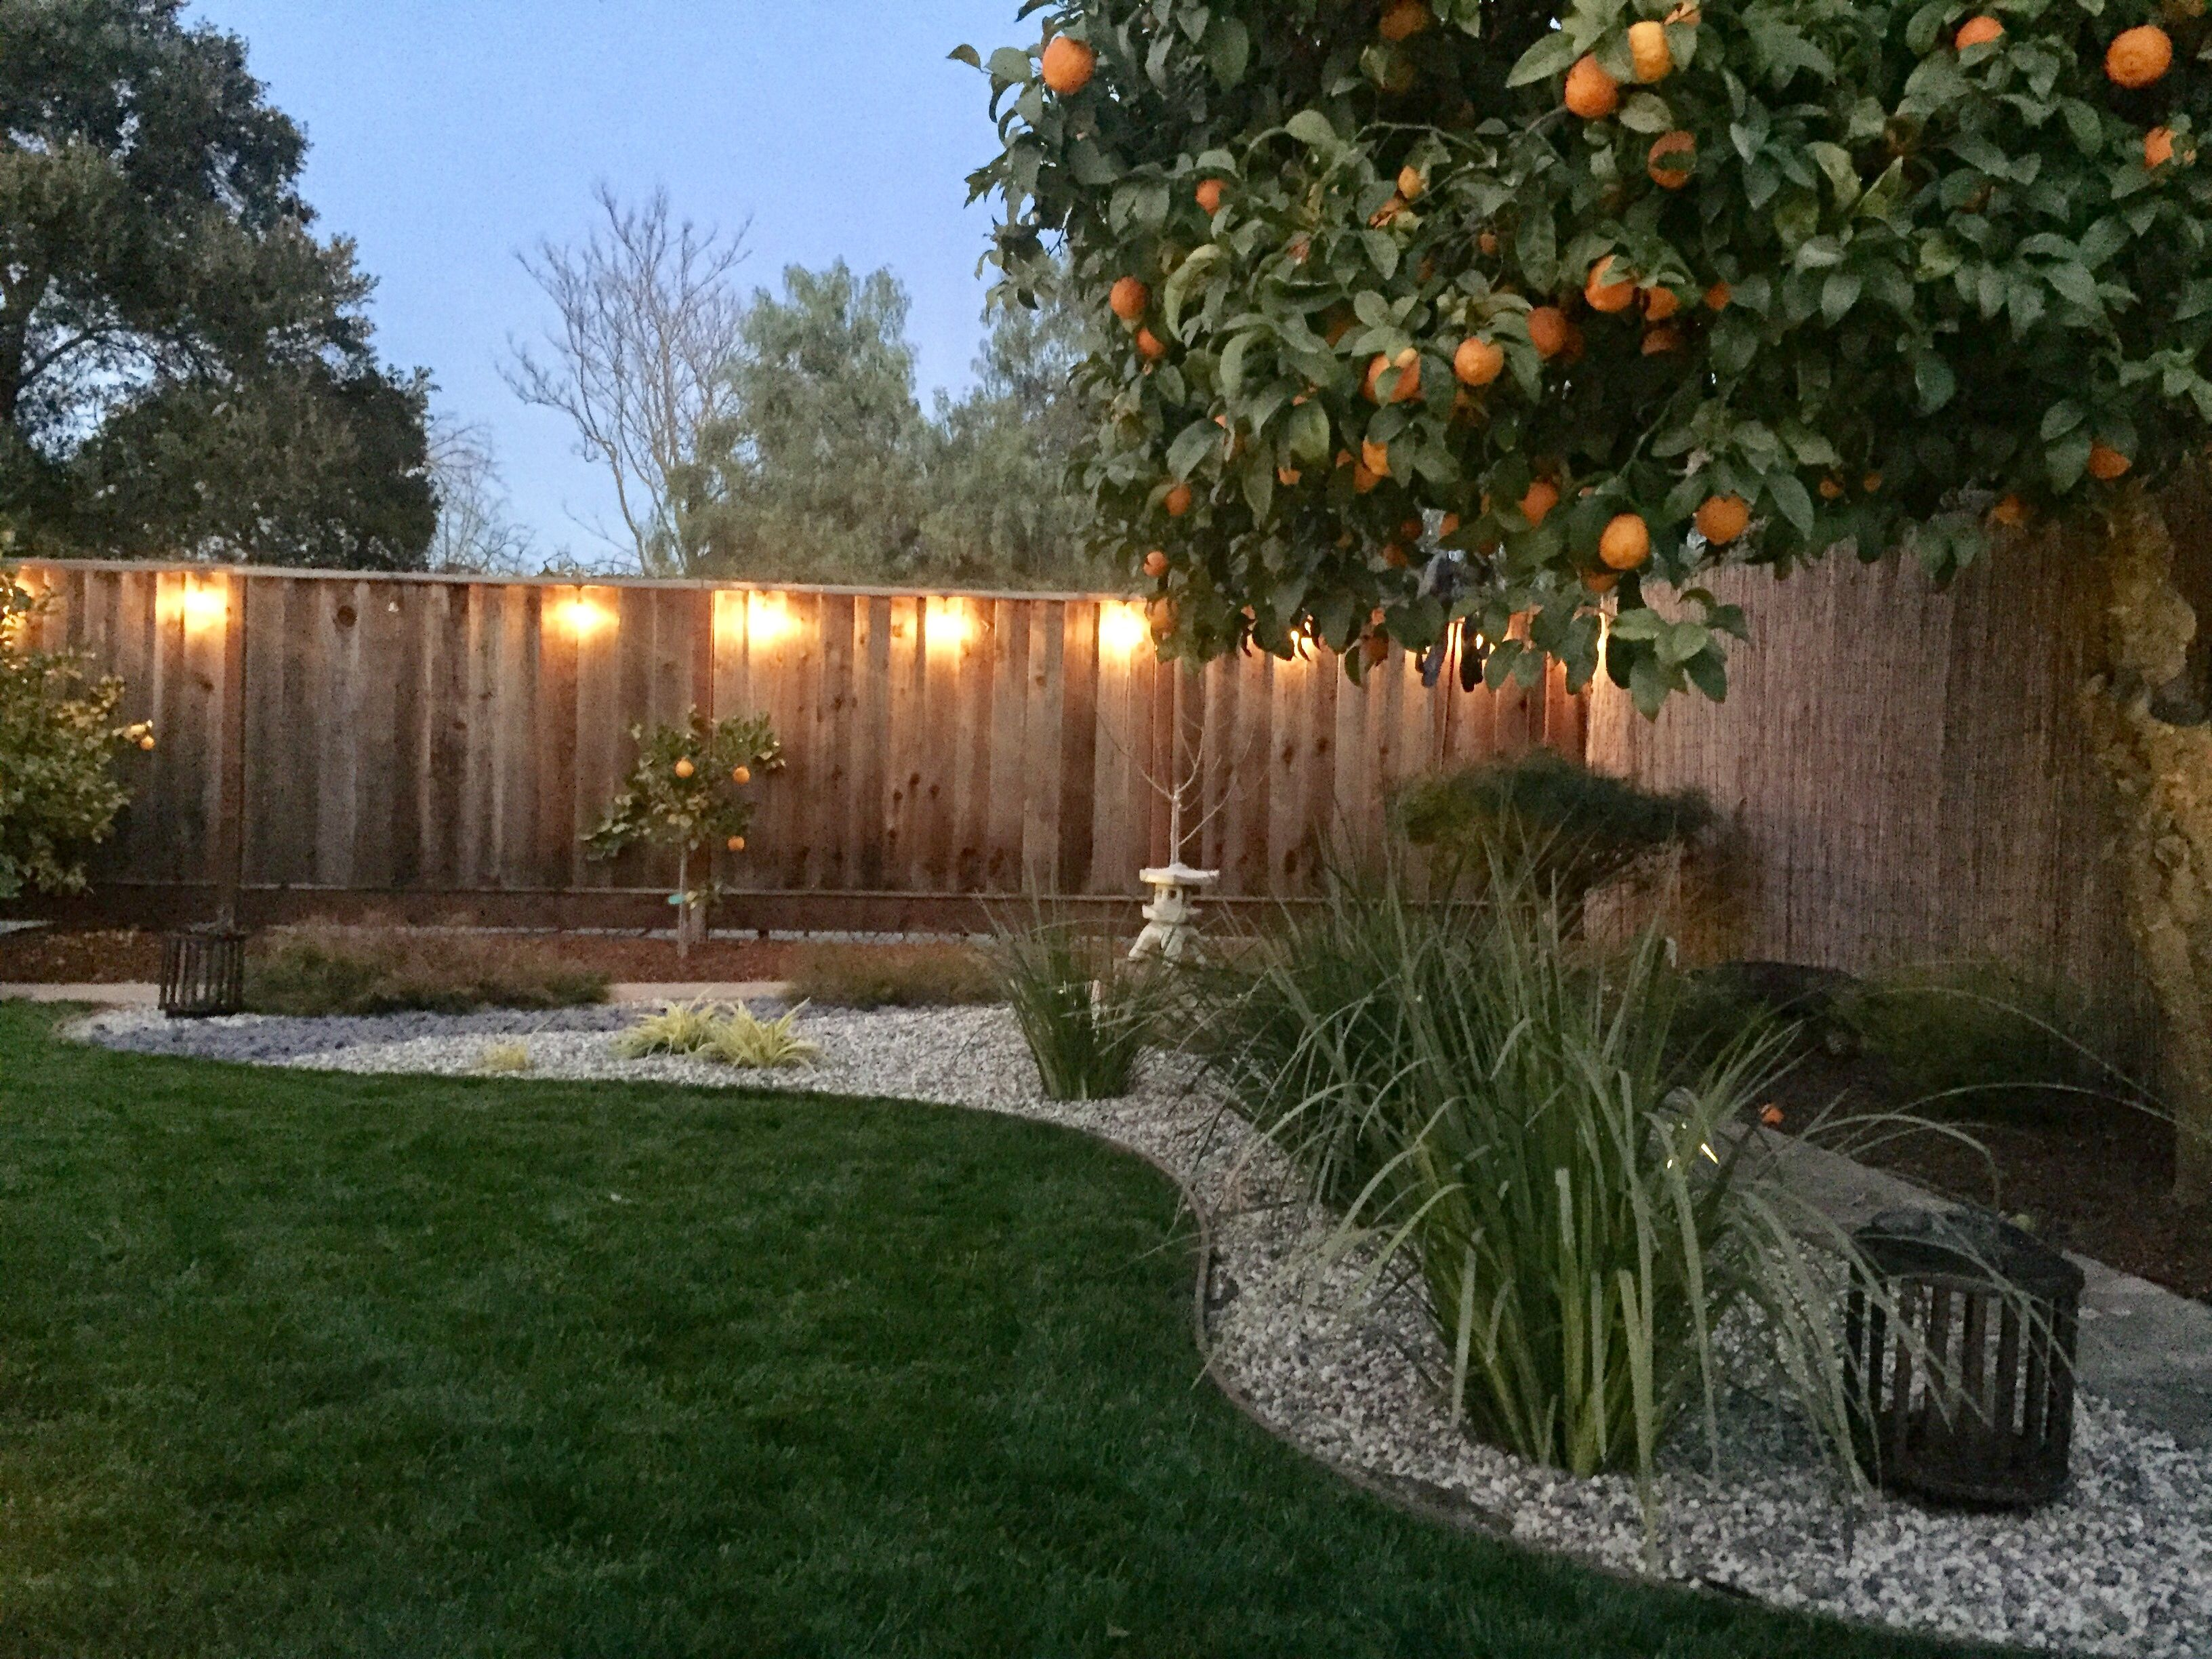 Pin By Cincere Eades On Backyard Ideas Backyard Landscaping Designs Small Backyard Landscaping Backyard Decor Small farmhouse backyard ideas